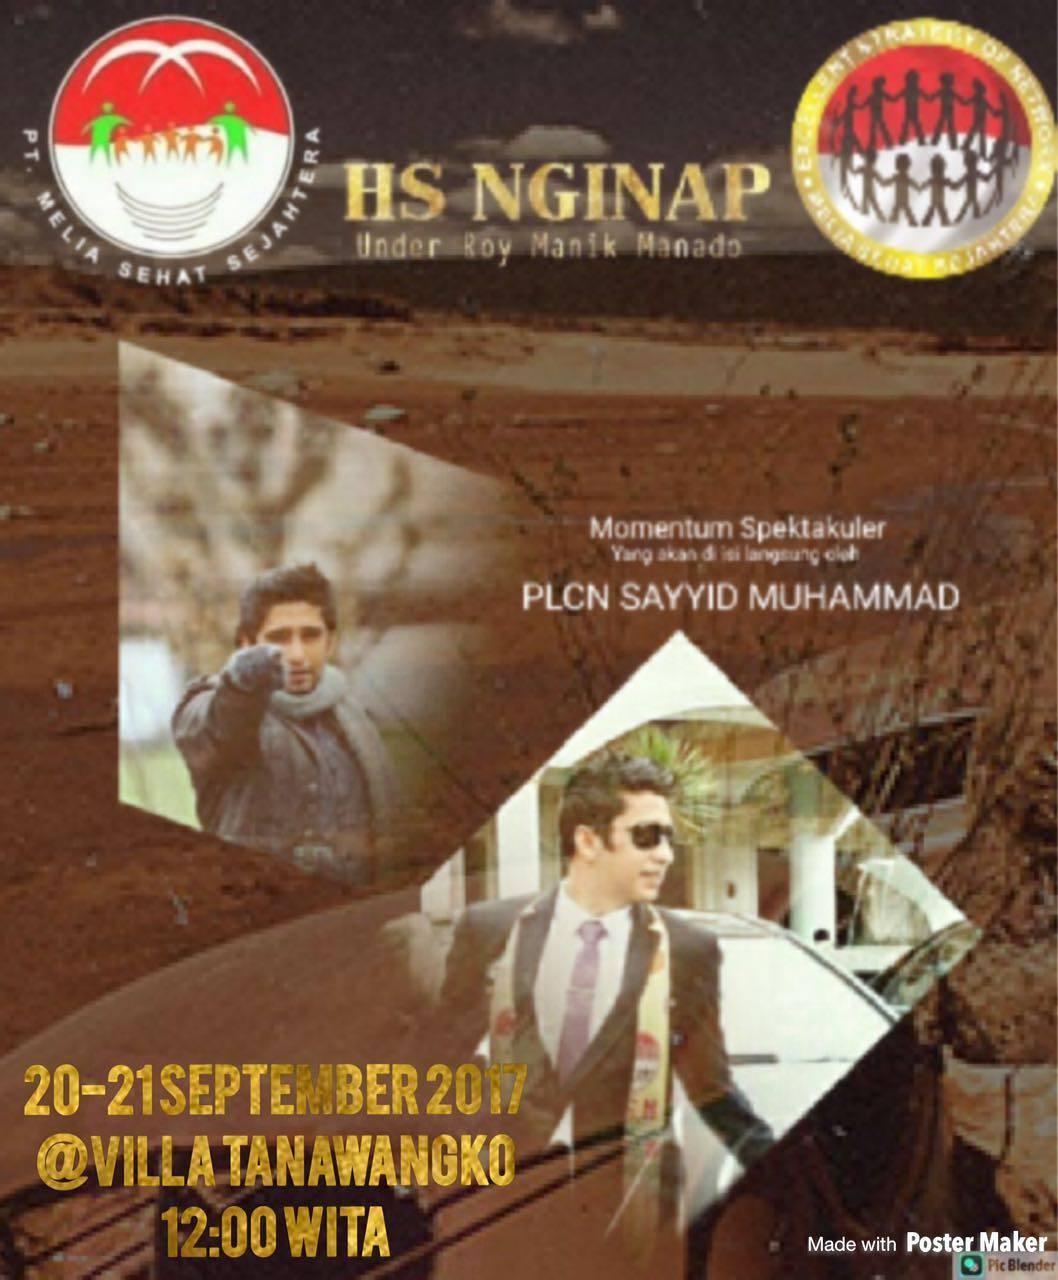 HS Nginap Manado 20-21 September